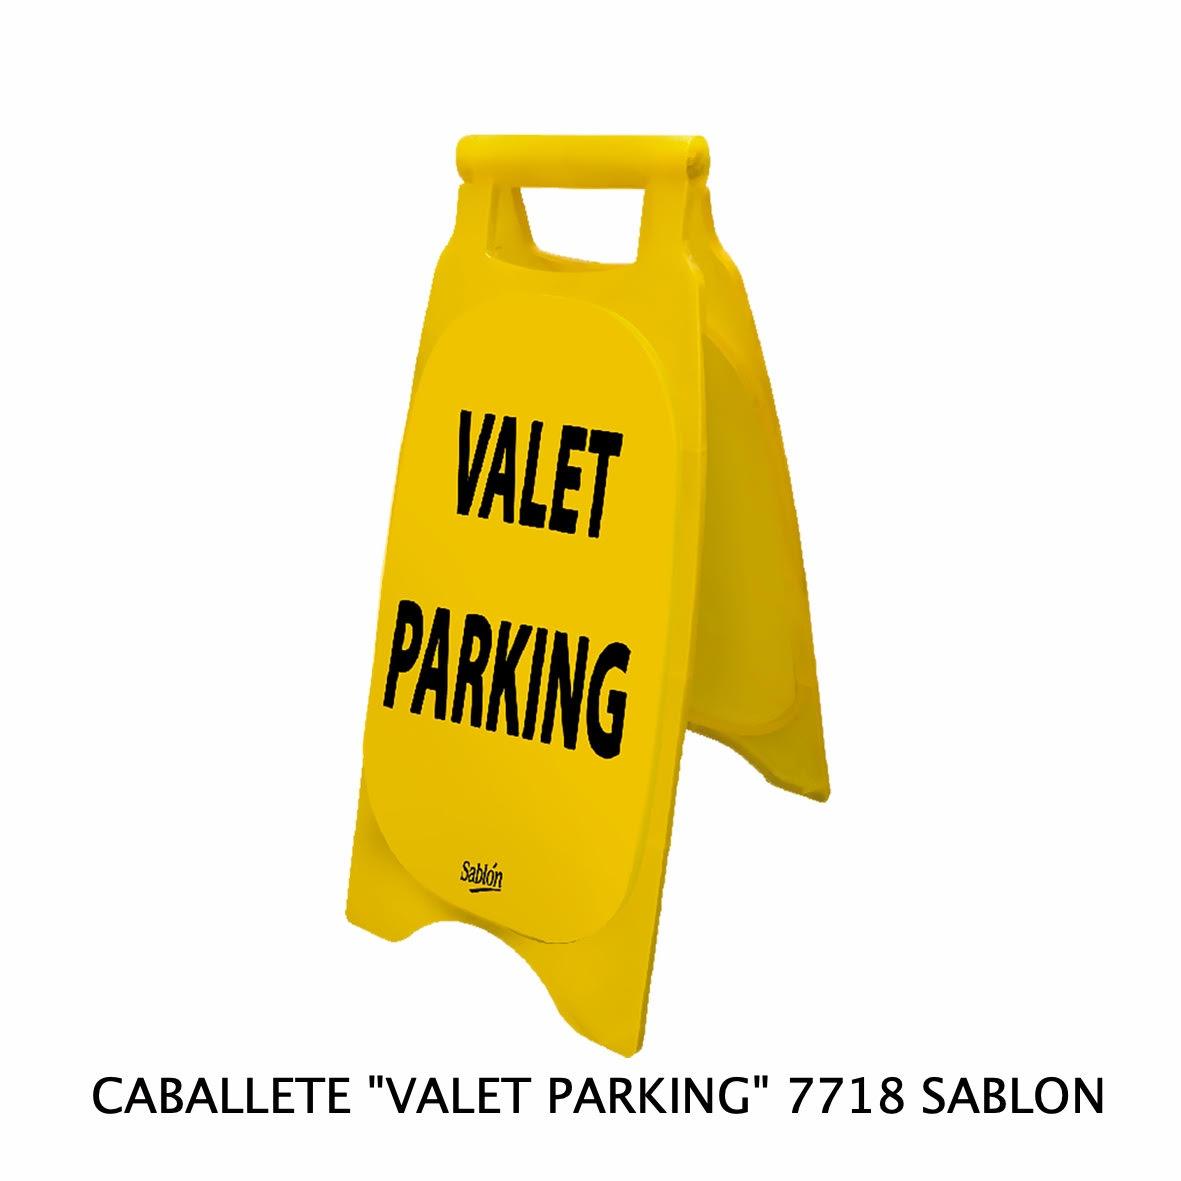 Caballete con señal VALET PARKING Clave 7718 de Sablón